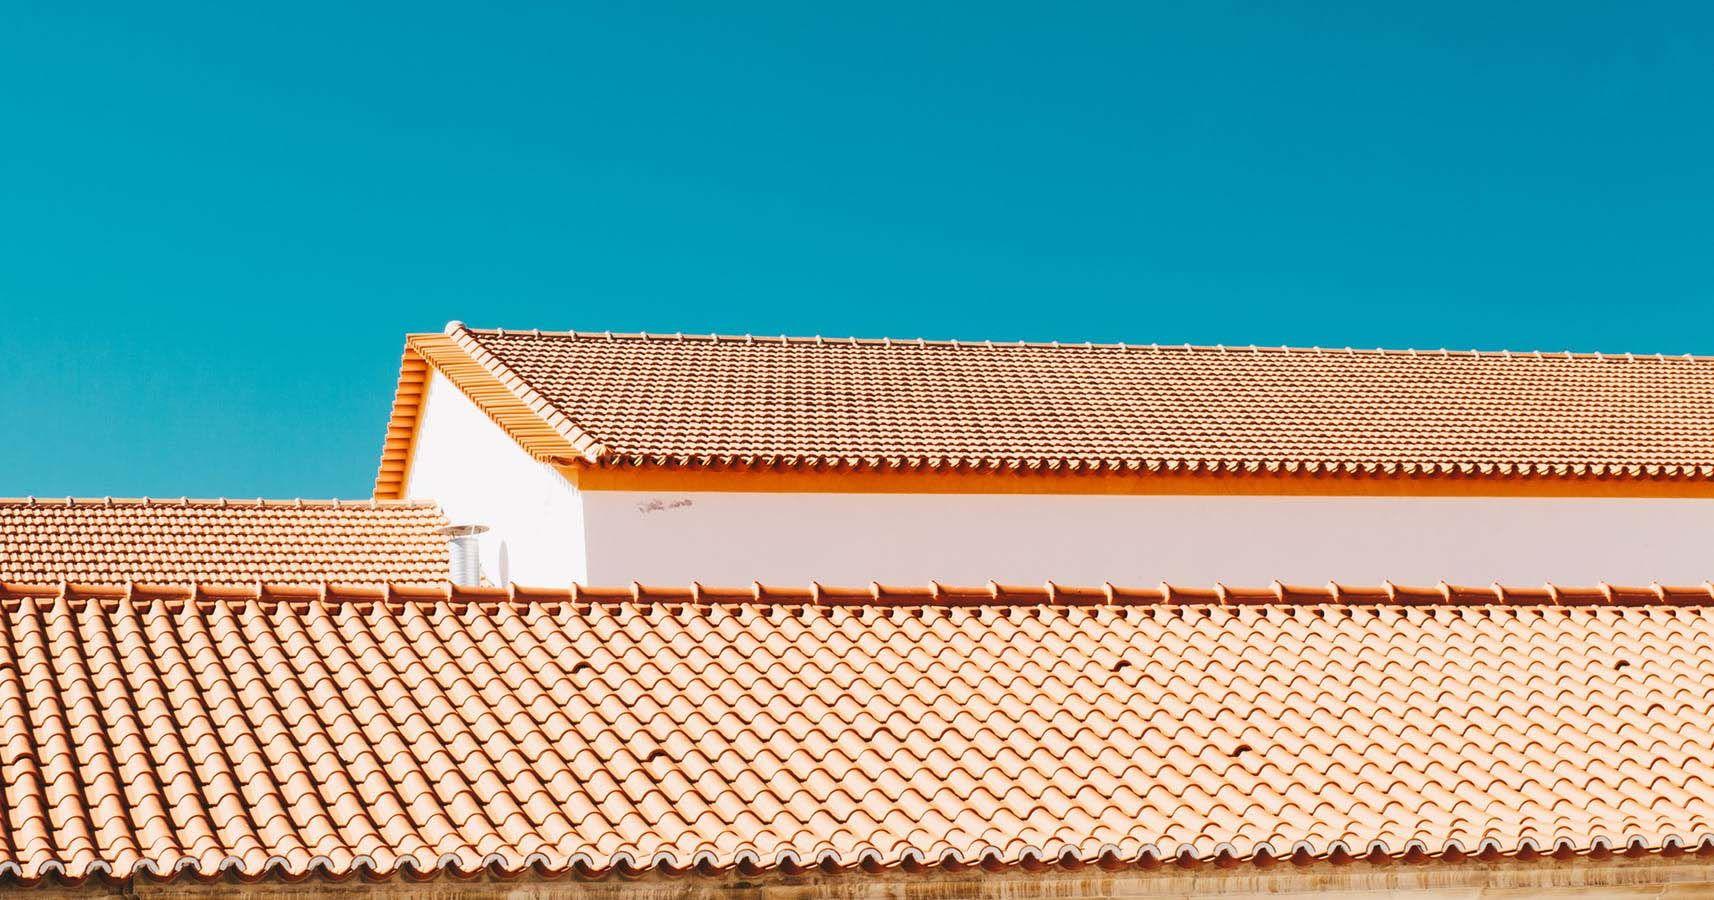 1. Segera mengganti atap rusak